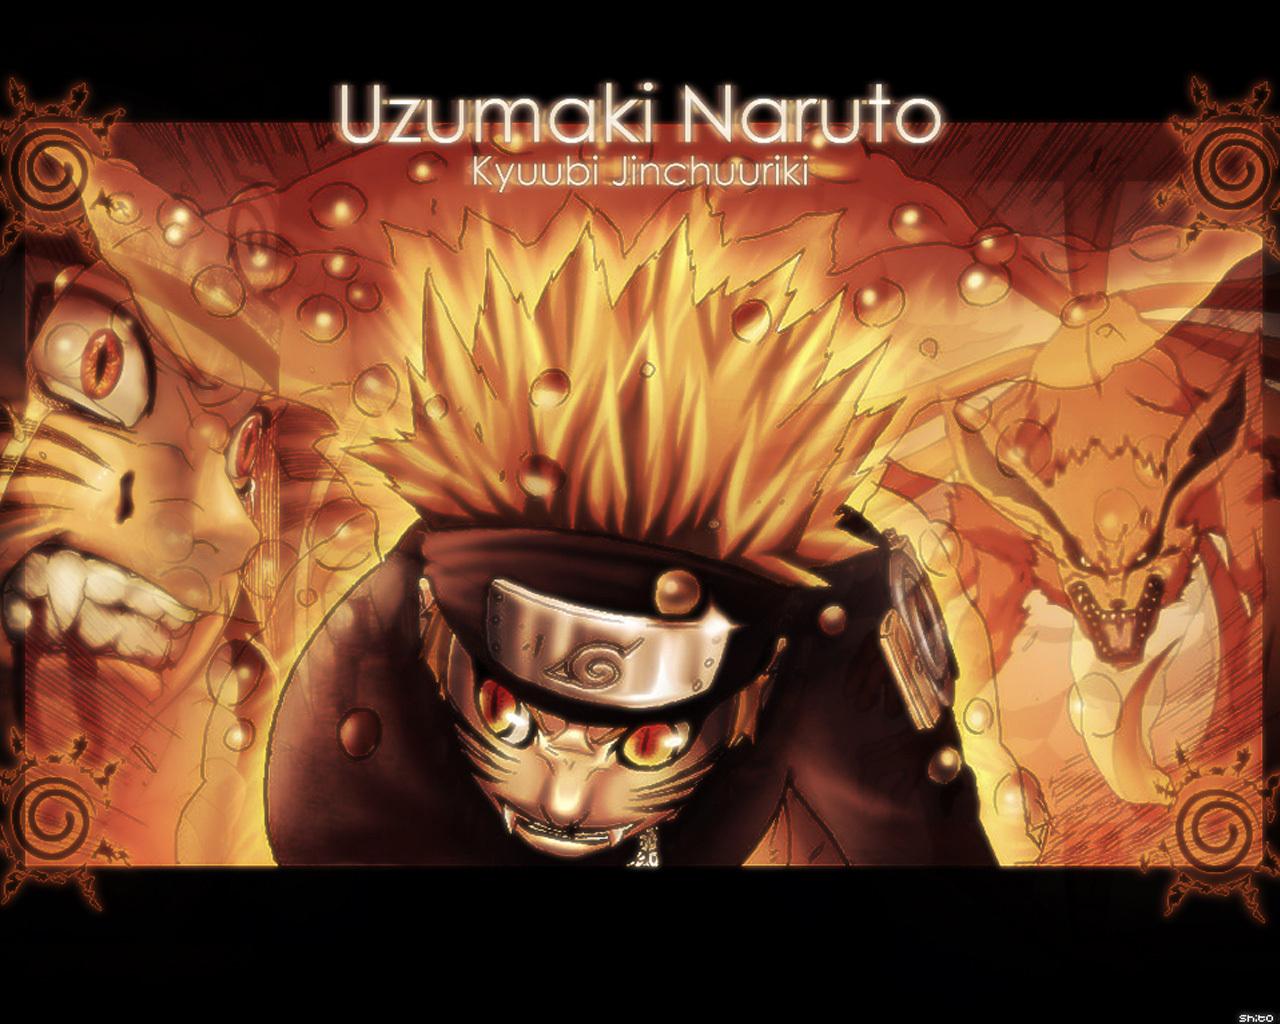 Naruto Uzumaki Shippuden Kyuubi Wallpapers Hd Background Wallpaper 1280x1024